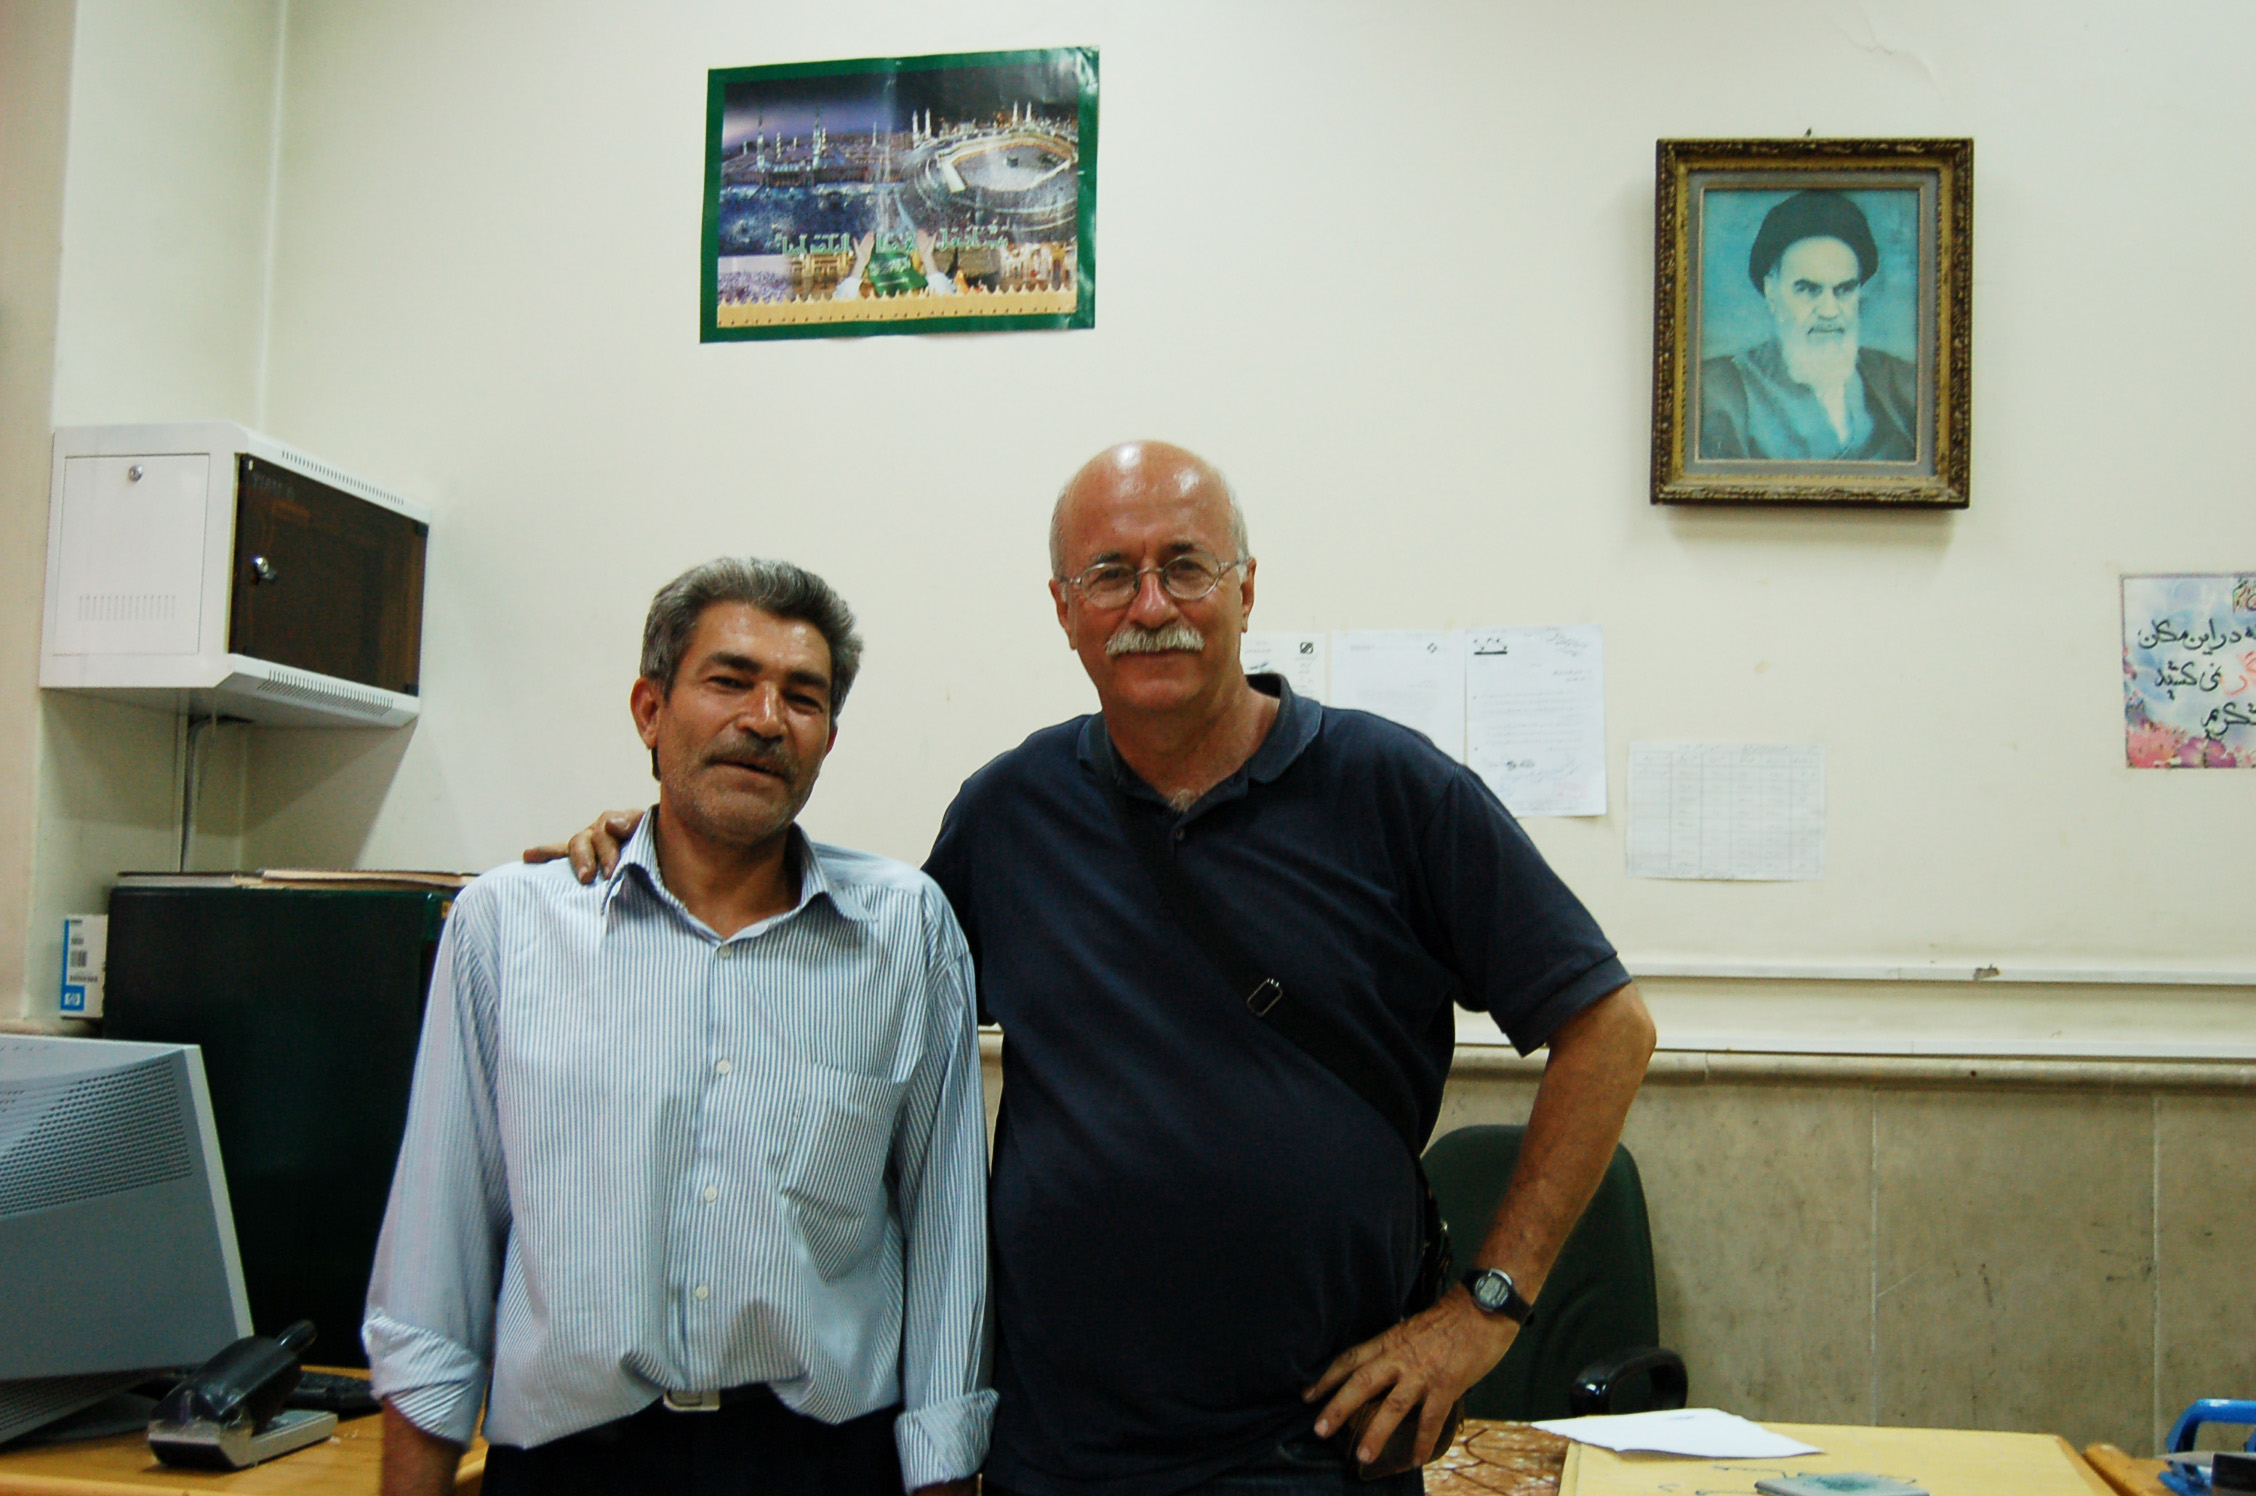 Frontiera iraniana insieme a Mr Suleimanjpg